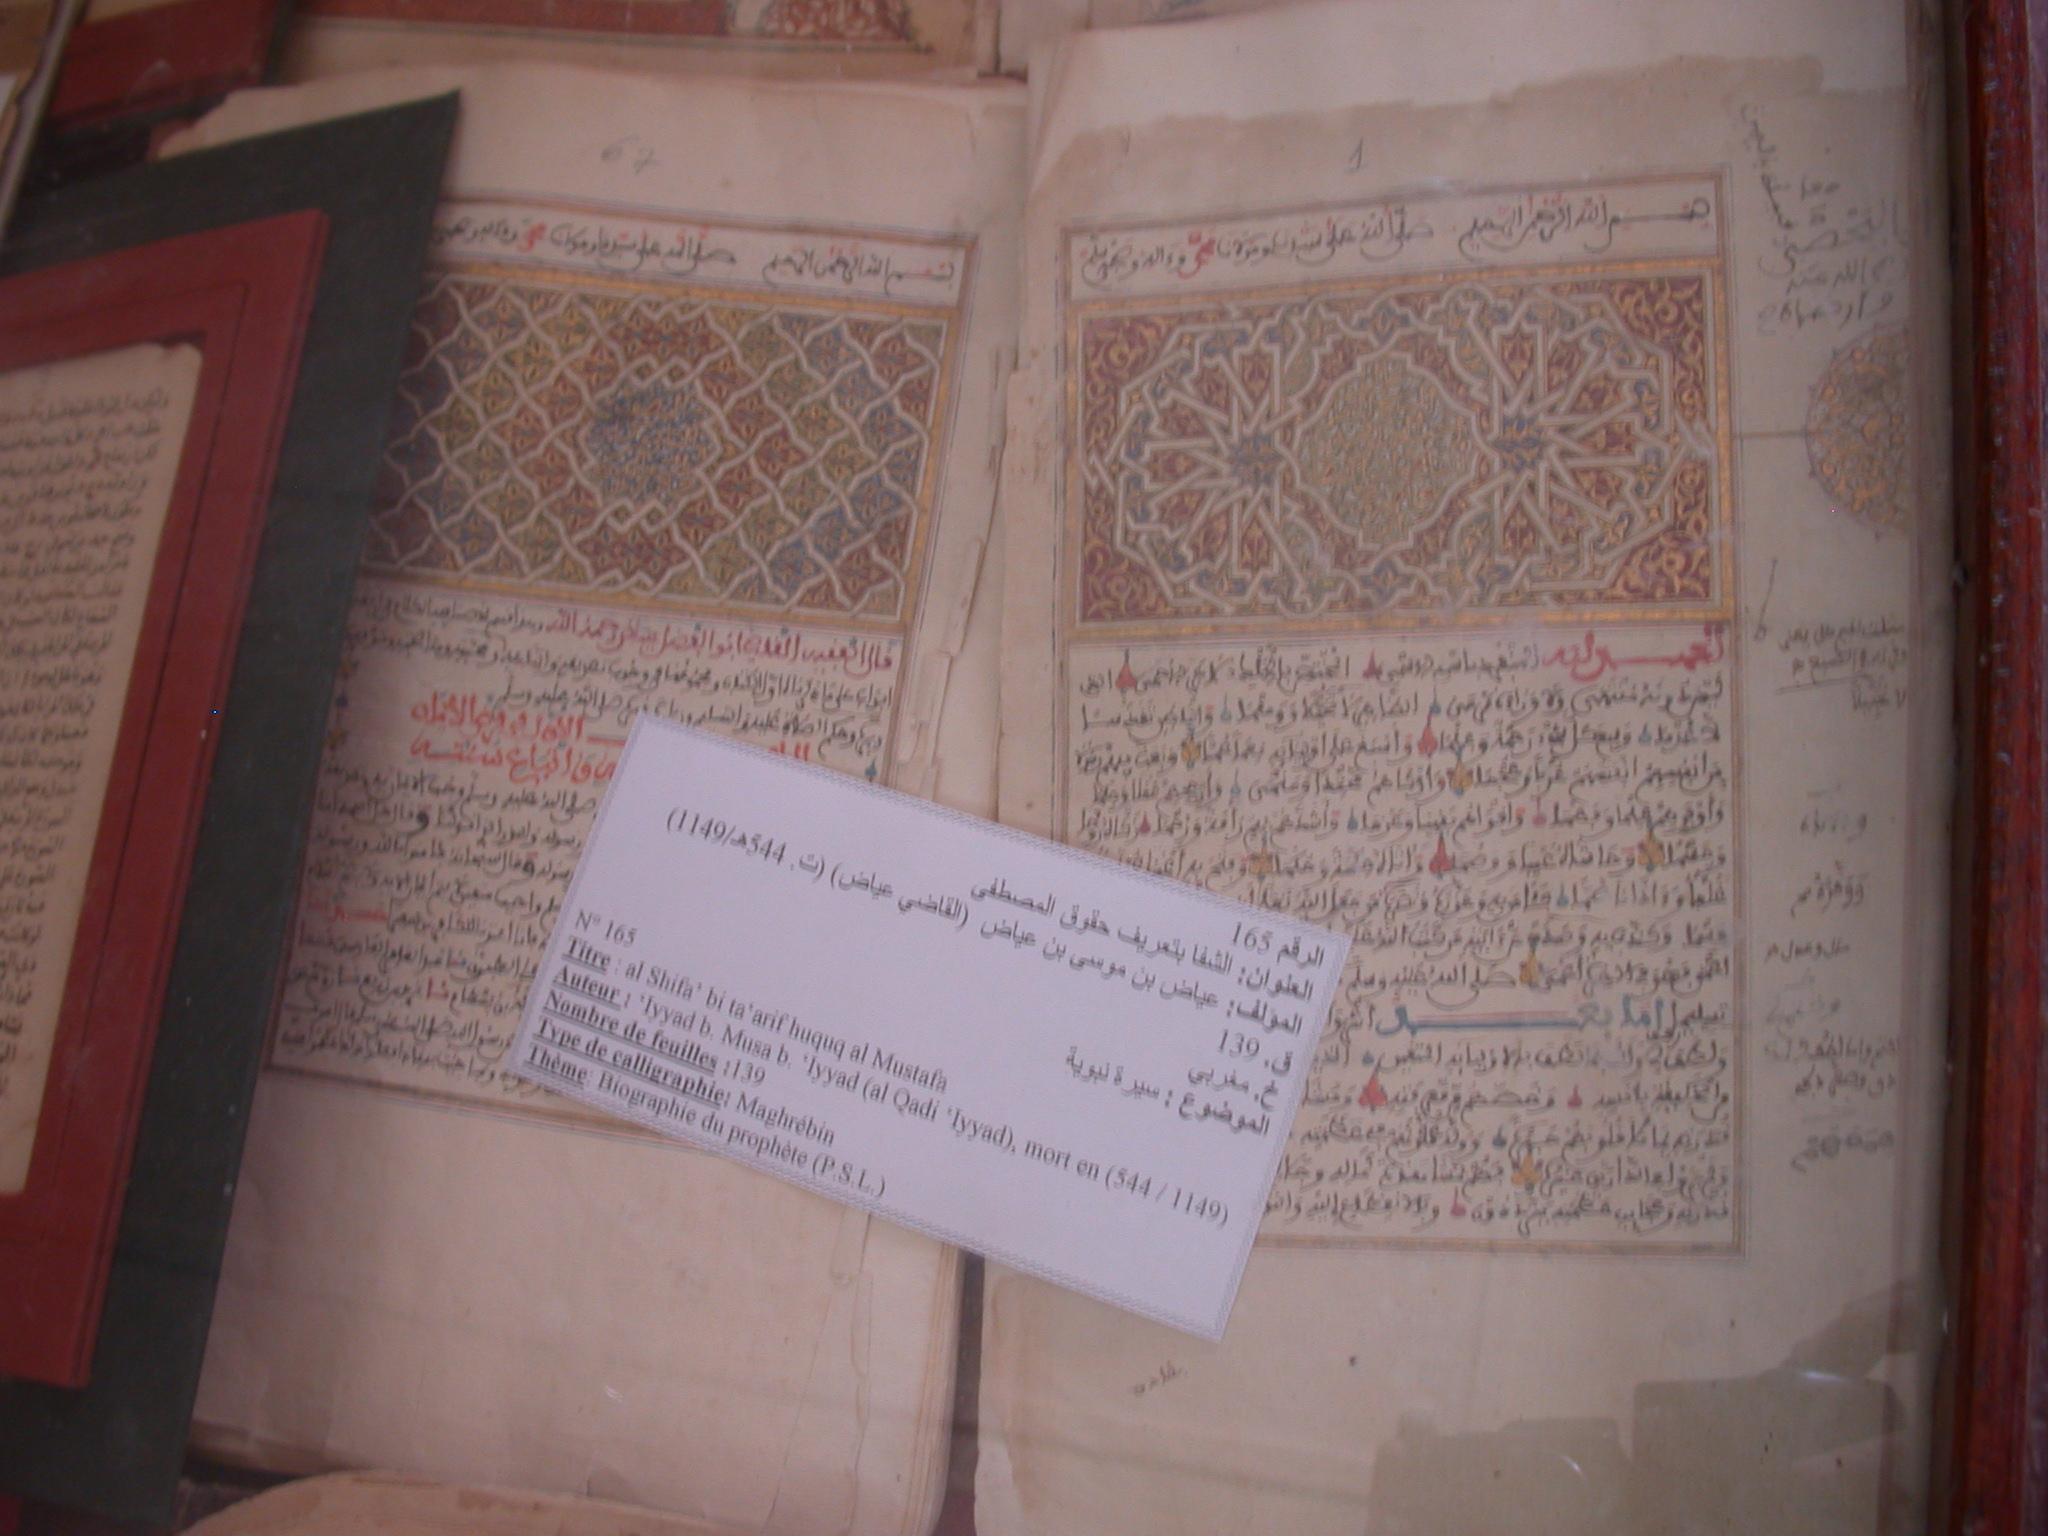 Photo of Manuscript, Al Shifa bi ta arif huquq al Mustafa, Ahmed Baba Institute, Institut des Hautes Etudes et de Recherches Islamiques, Timbuktu, Mali